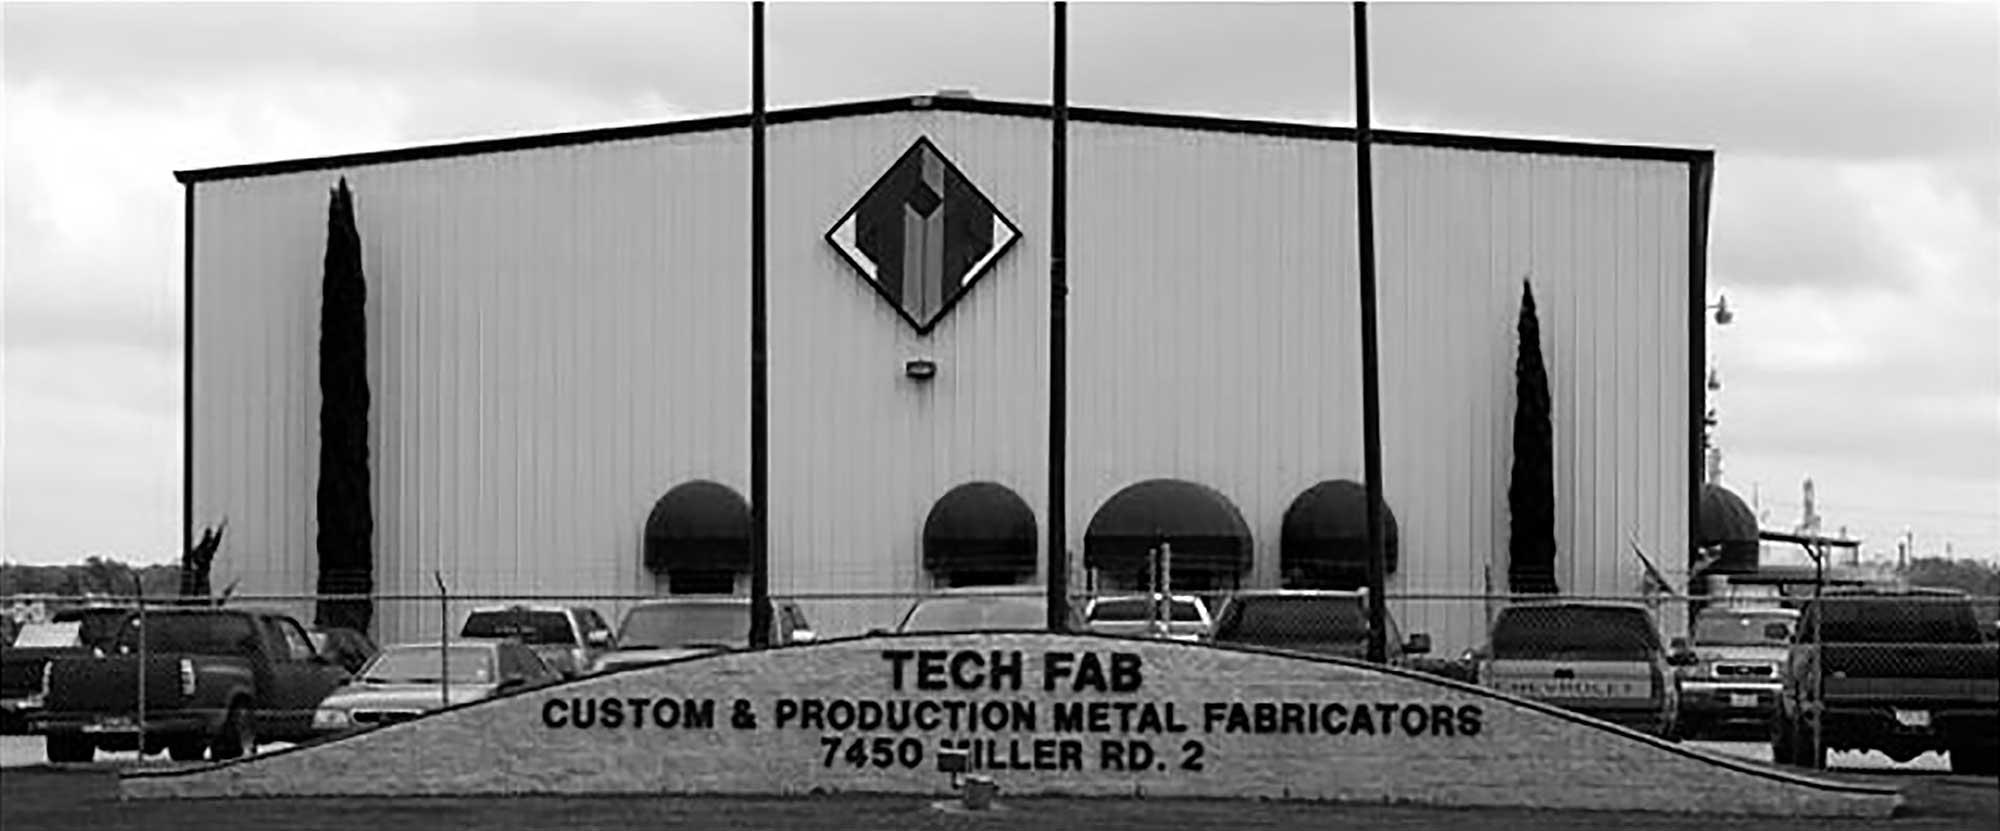 Tech Fab Building